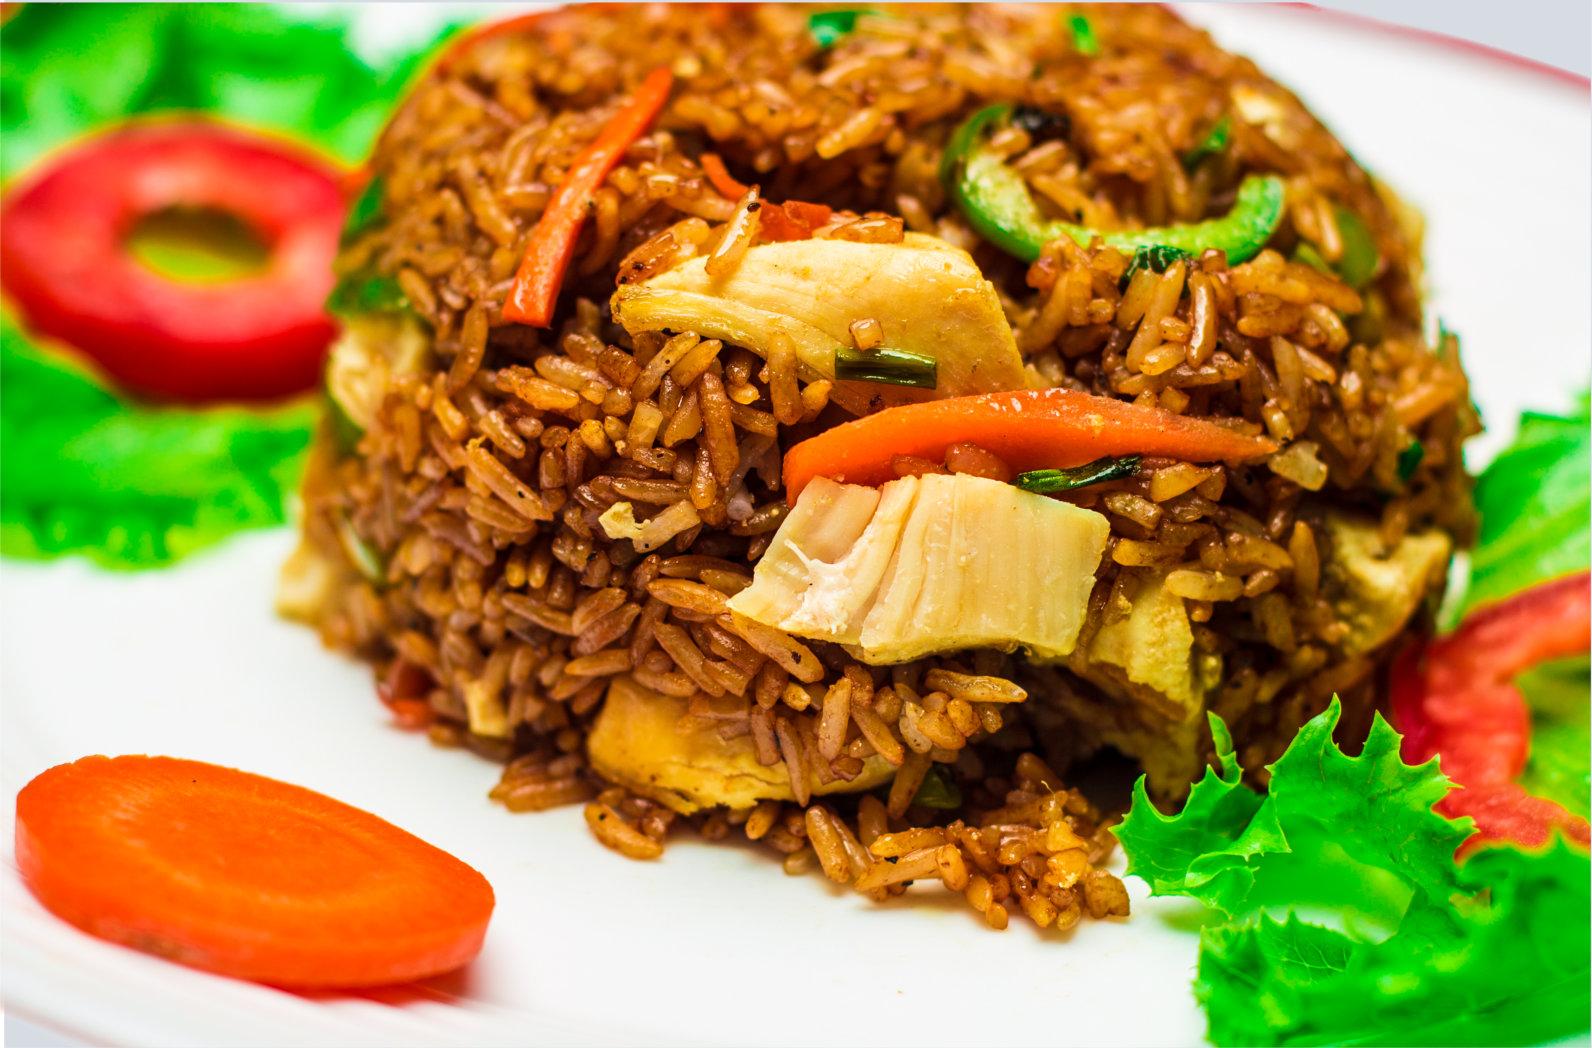 Shredded Chicken Fried Rice